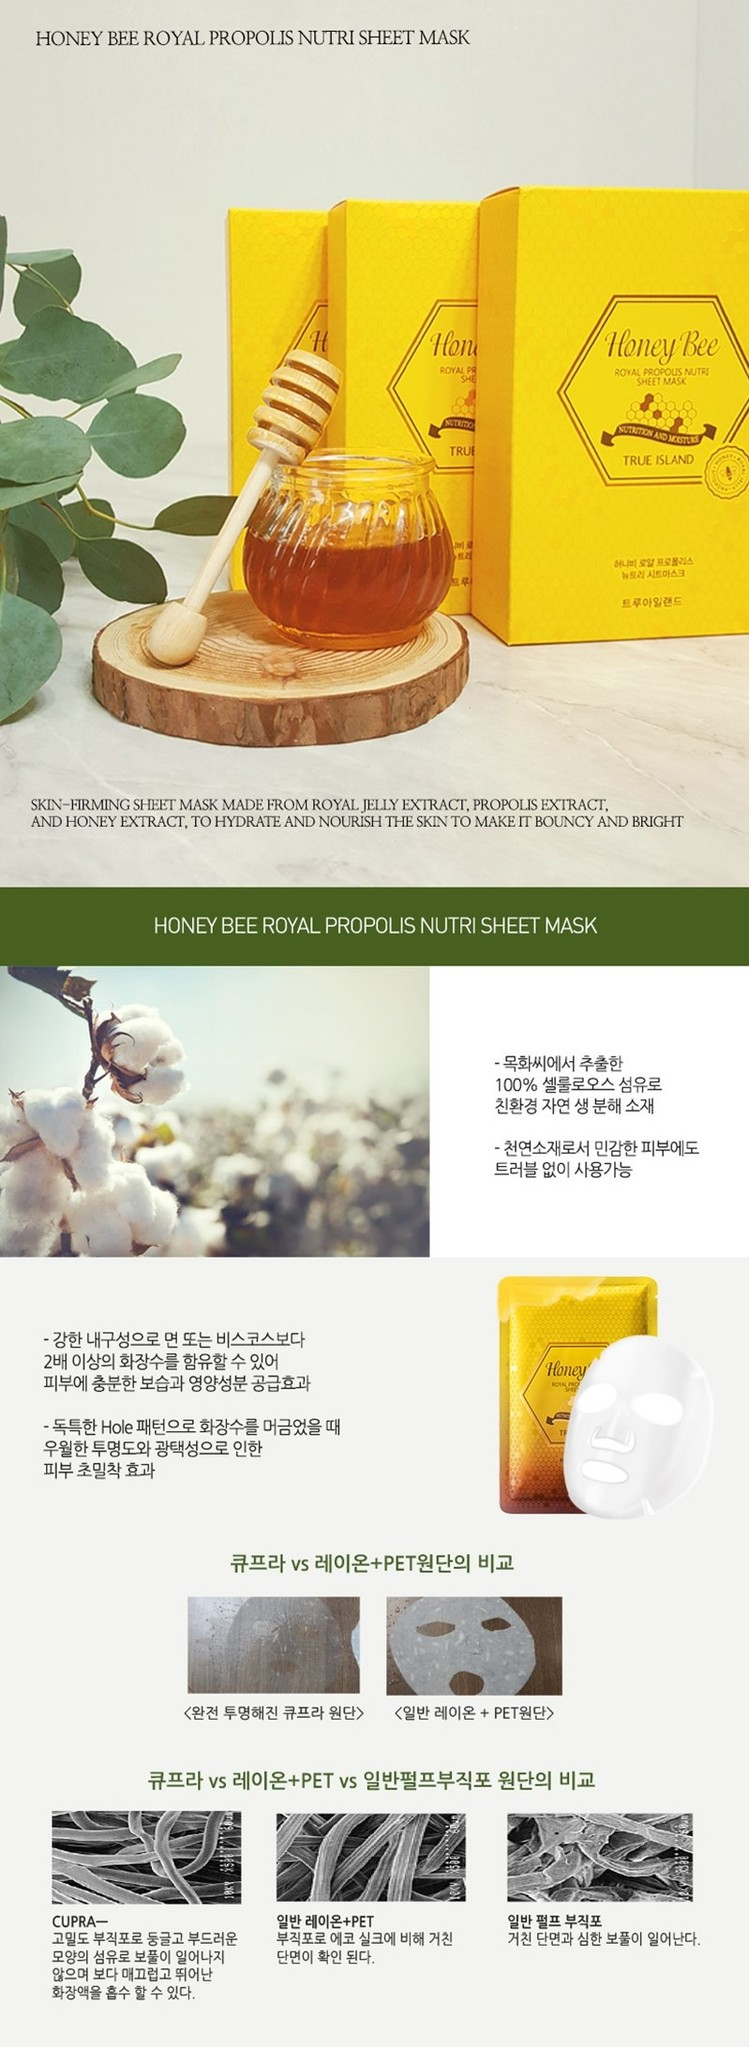 True Island Honey Bee Royal Propolis Nutri Sheet Mask-3